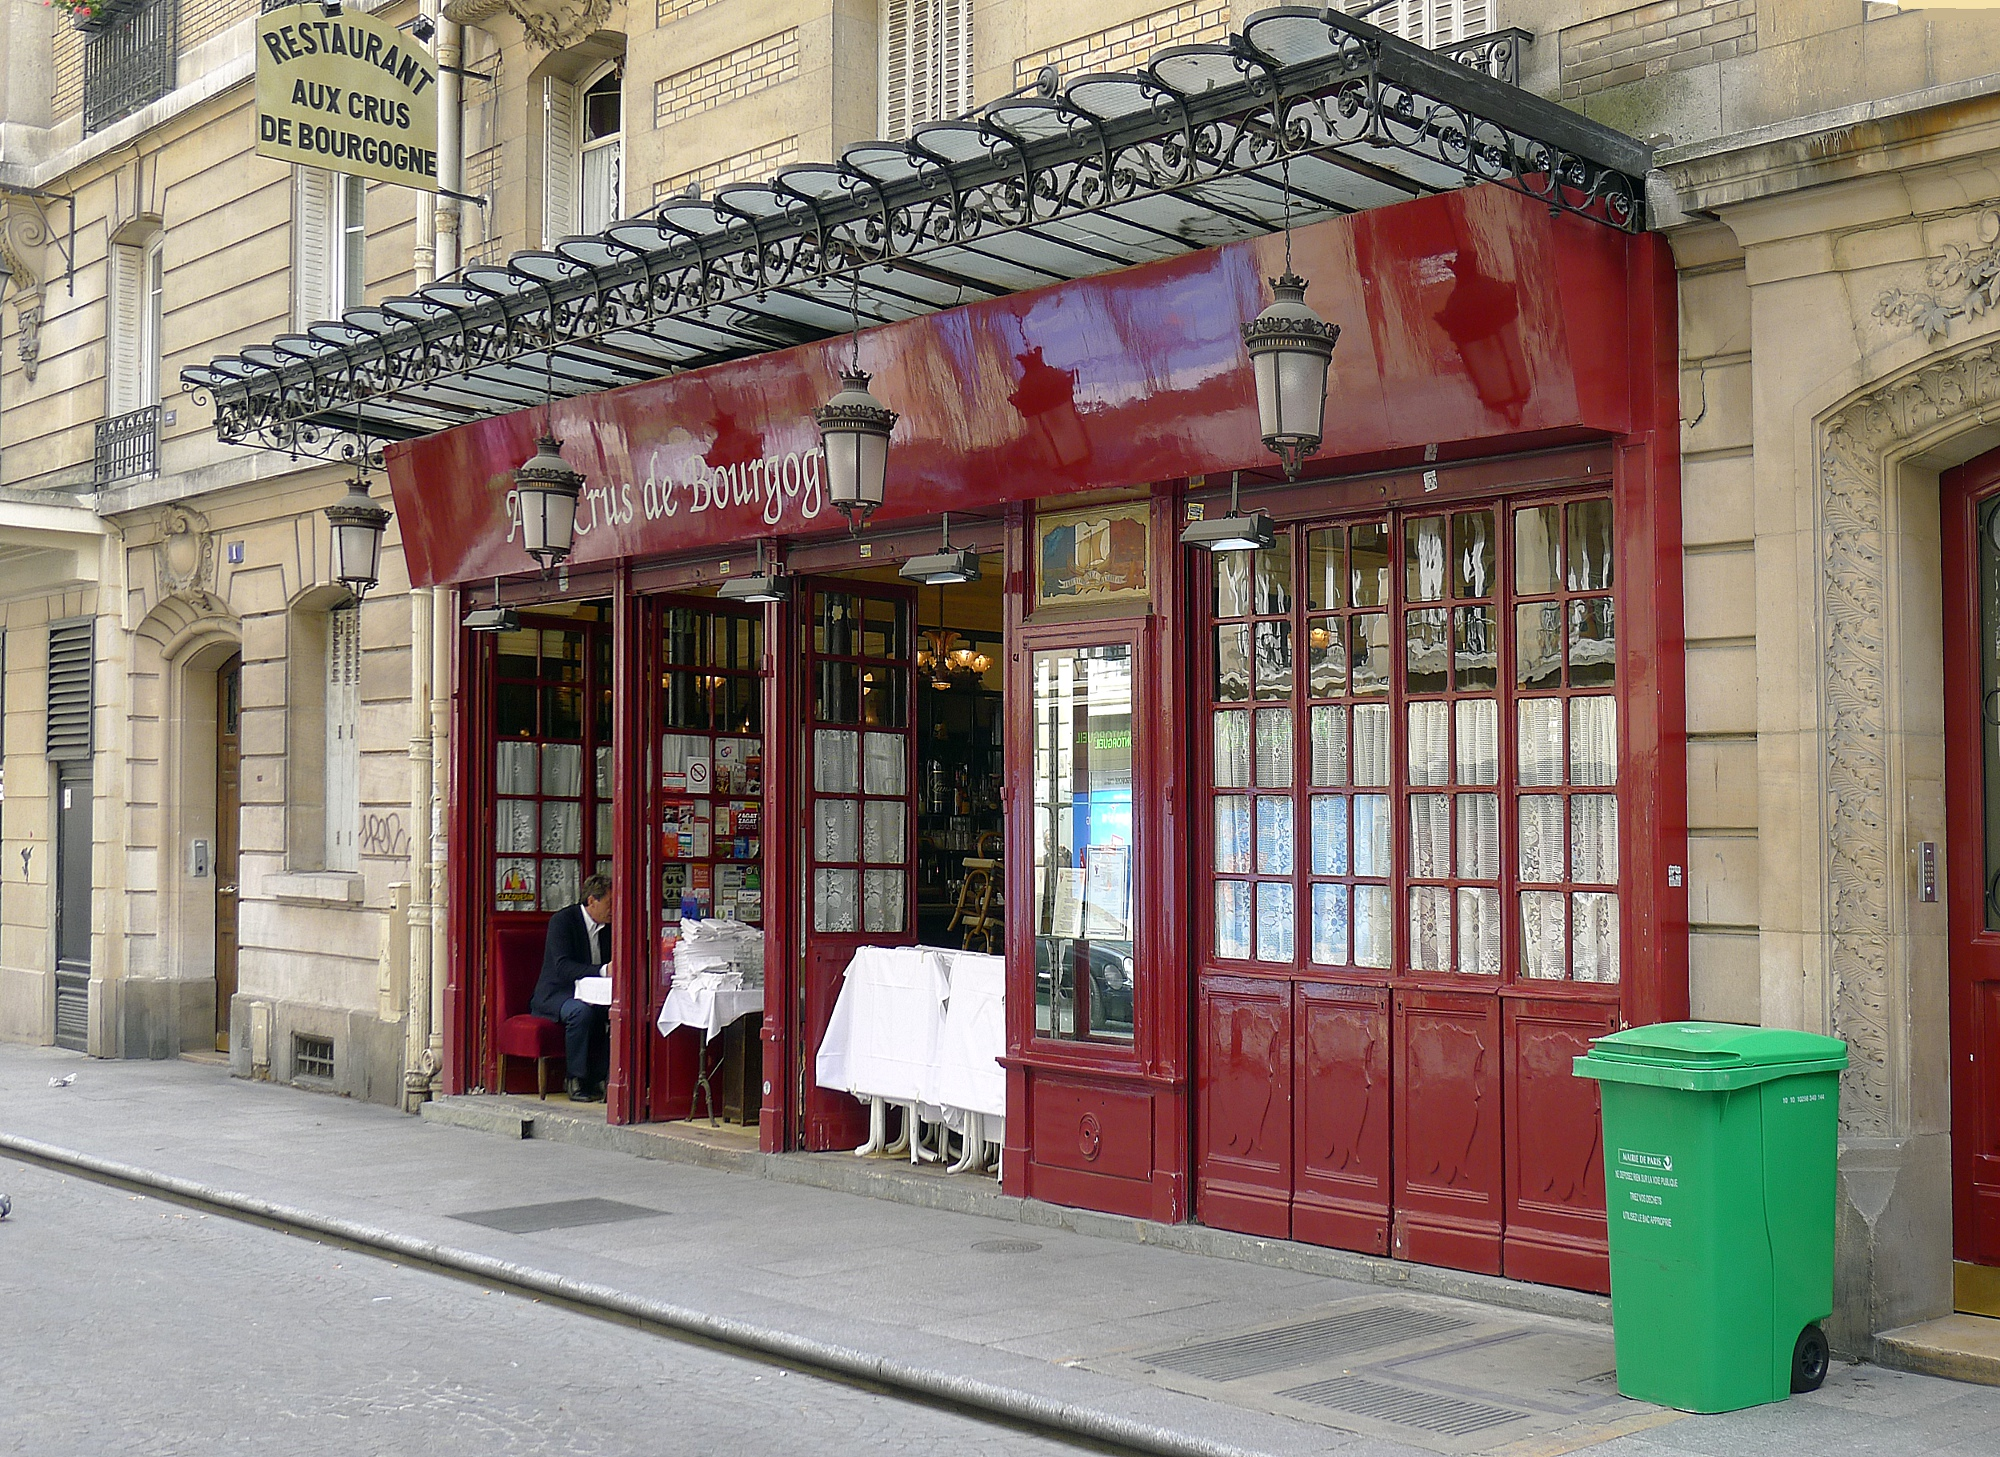 file p1100929 paris ii rue bachaumont vieux restaurant rwk. Black Bedroom Furniture Sets. Home Design Ideas